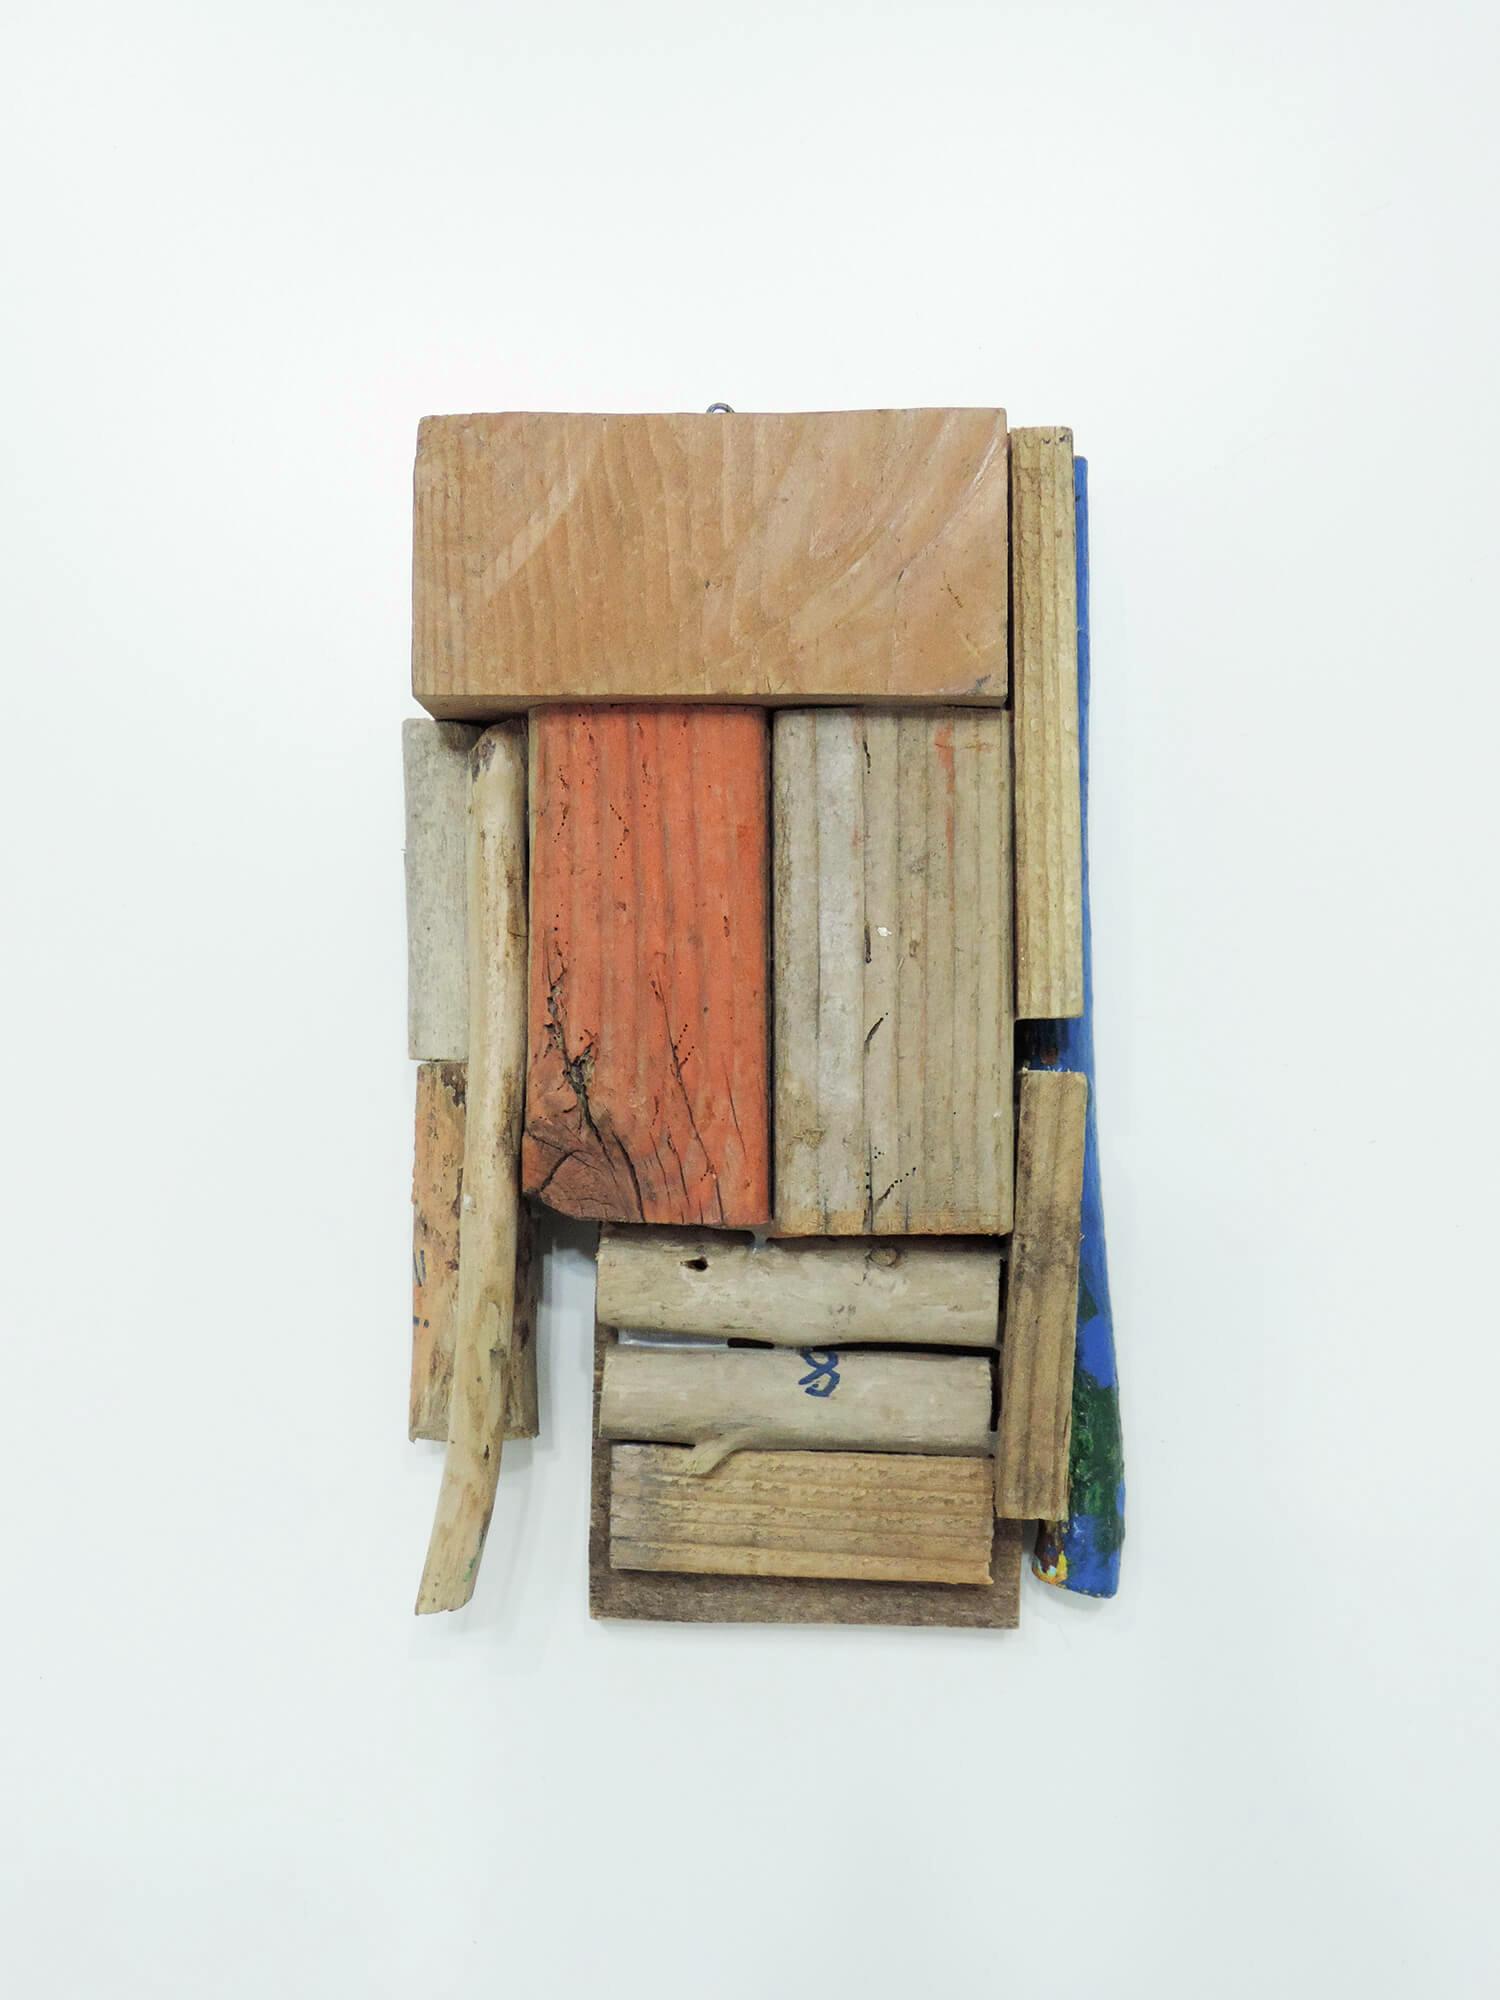 <b>Untitled</b><br>paint on wood 22 x 13 x 5.2 cm 1998